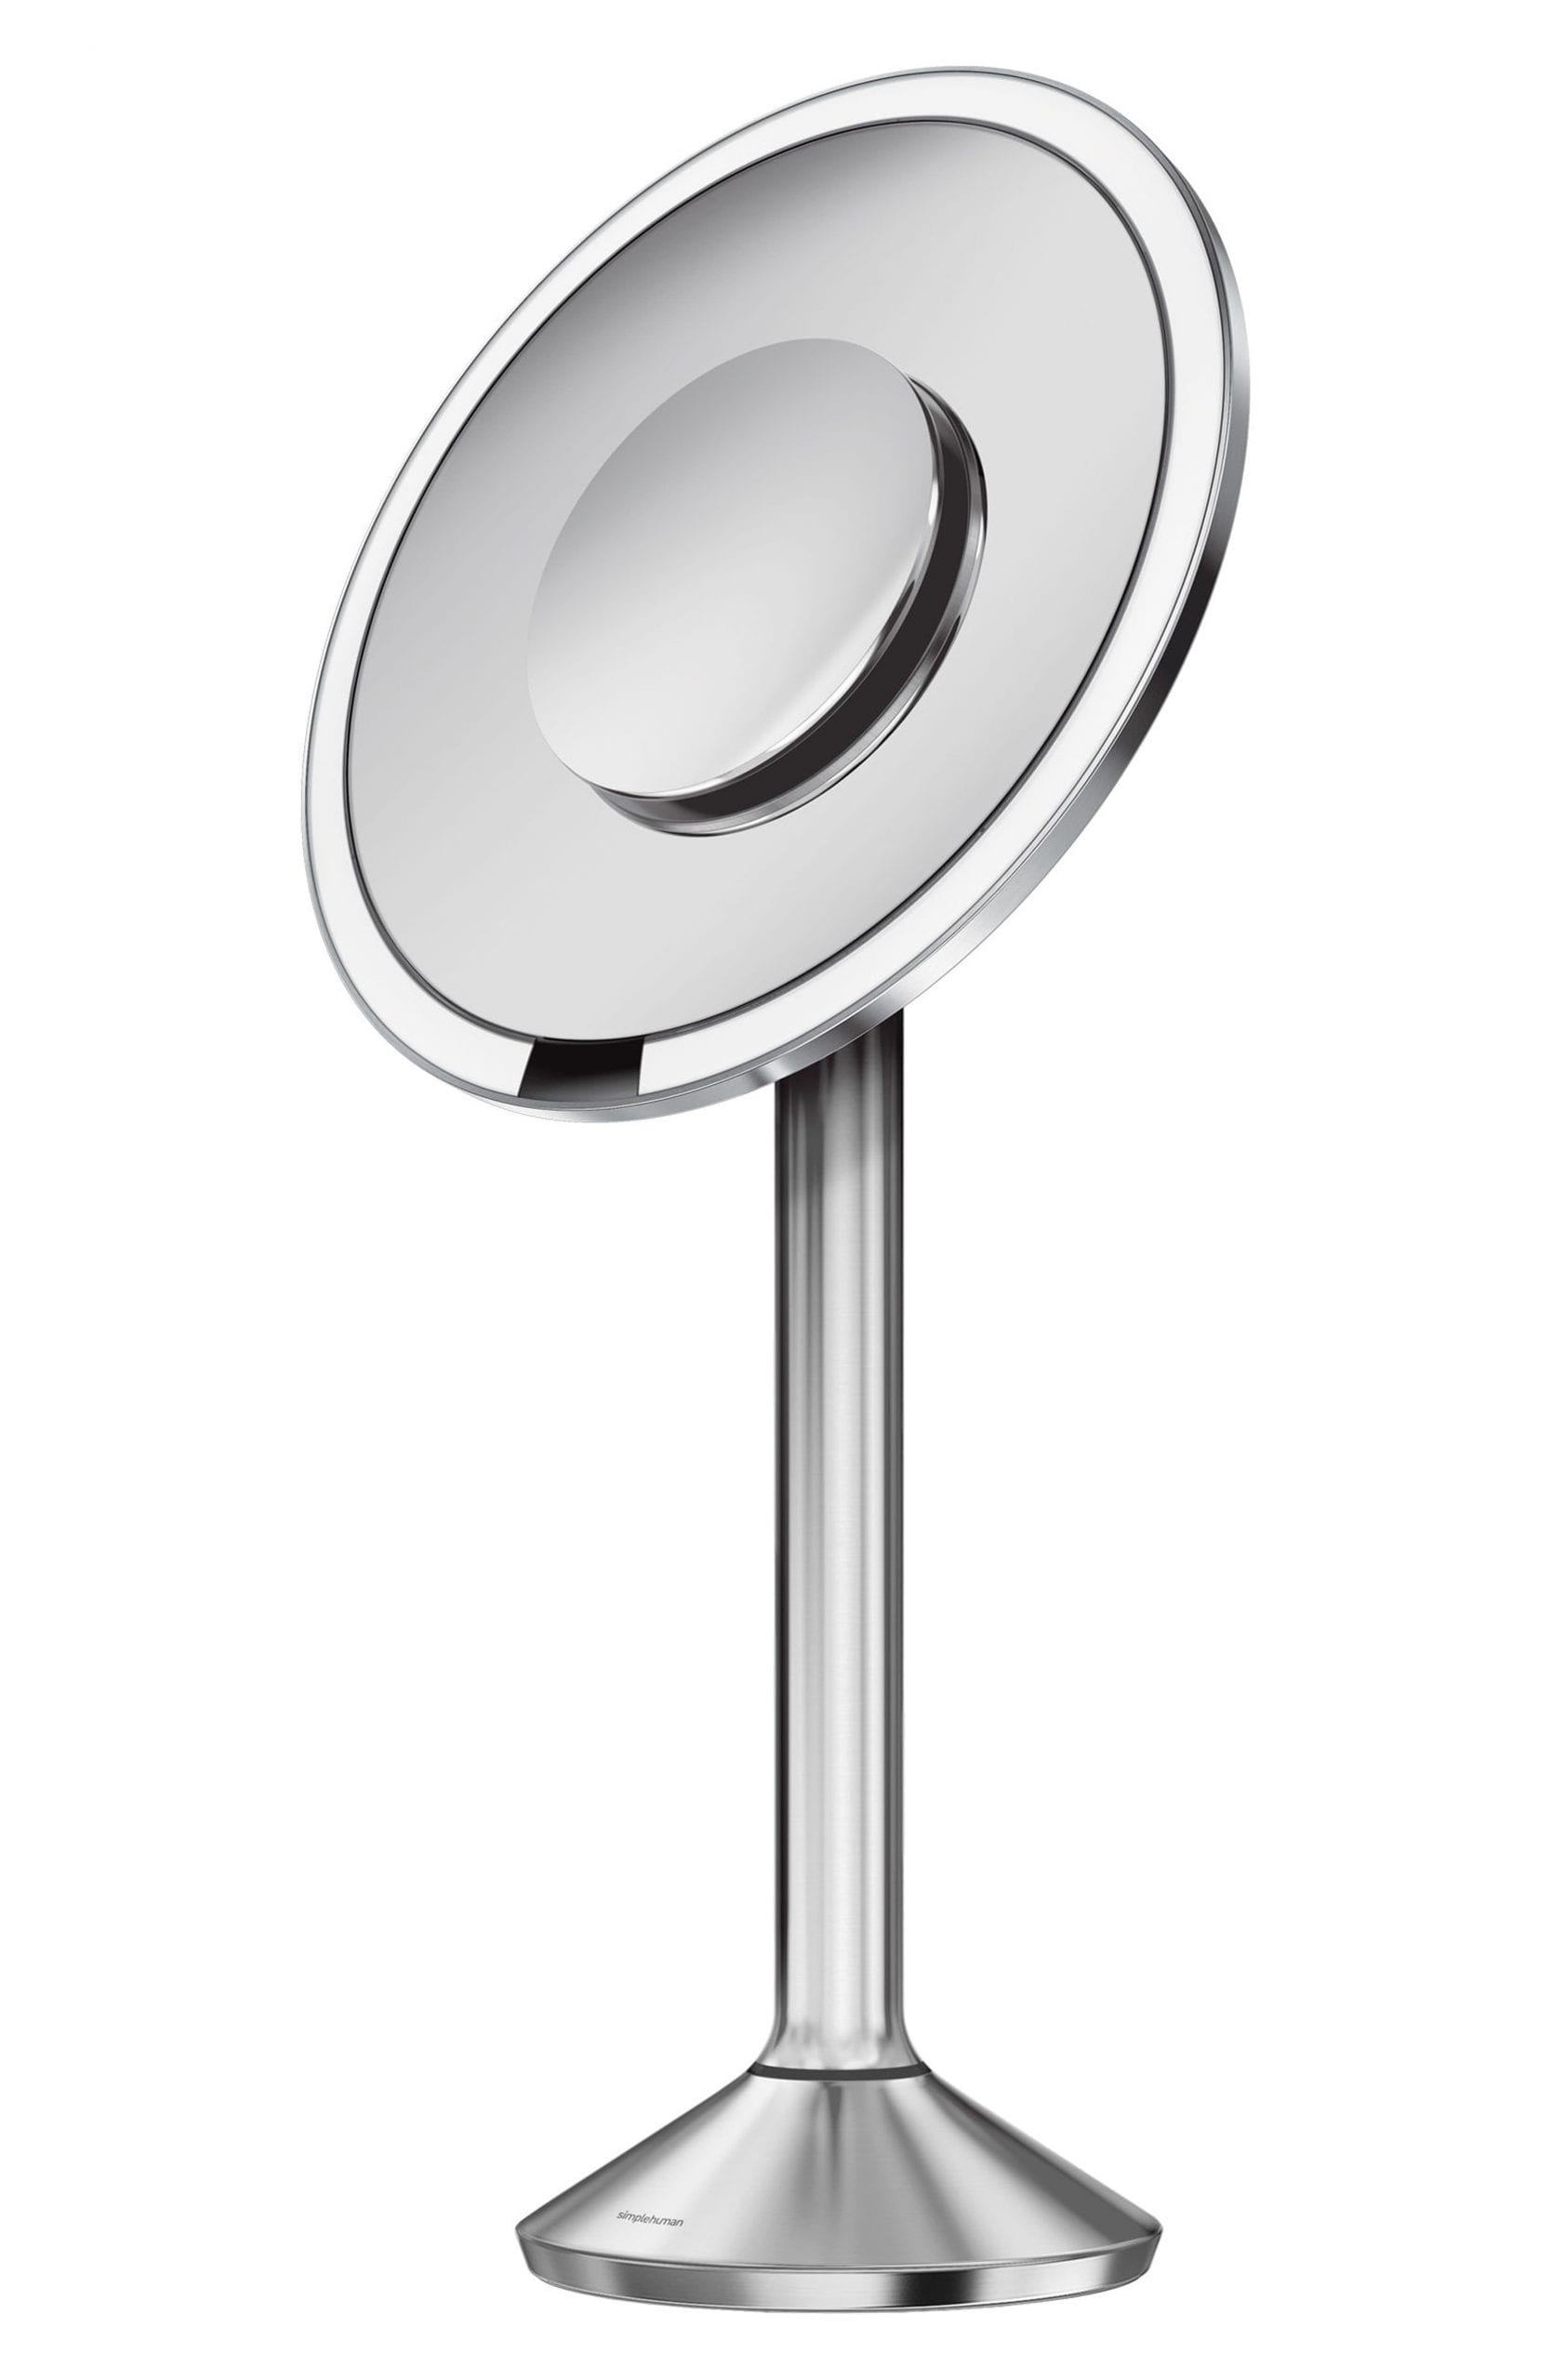 Nordstrom: Simplehuman 8 Inch Round Sensor Makeup Mirror Pro 5